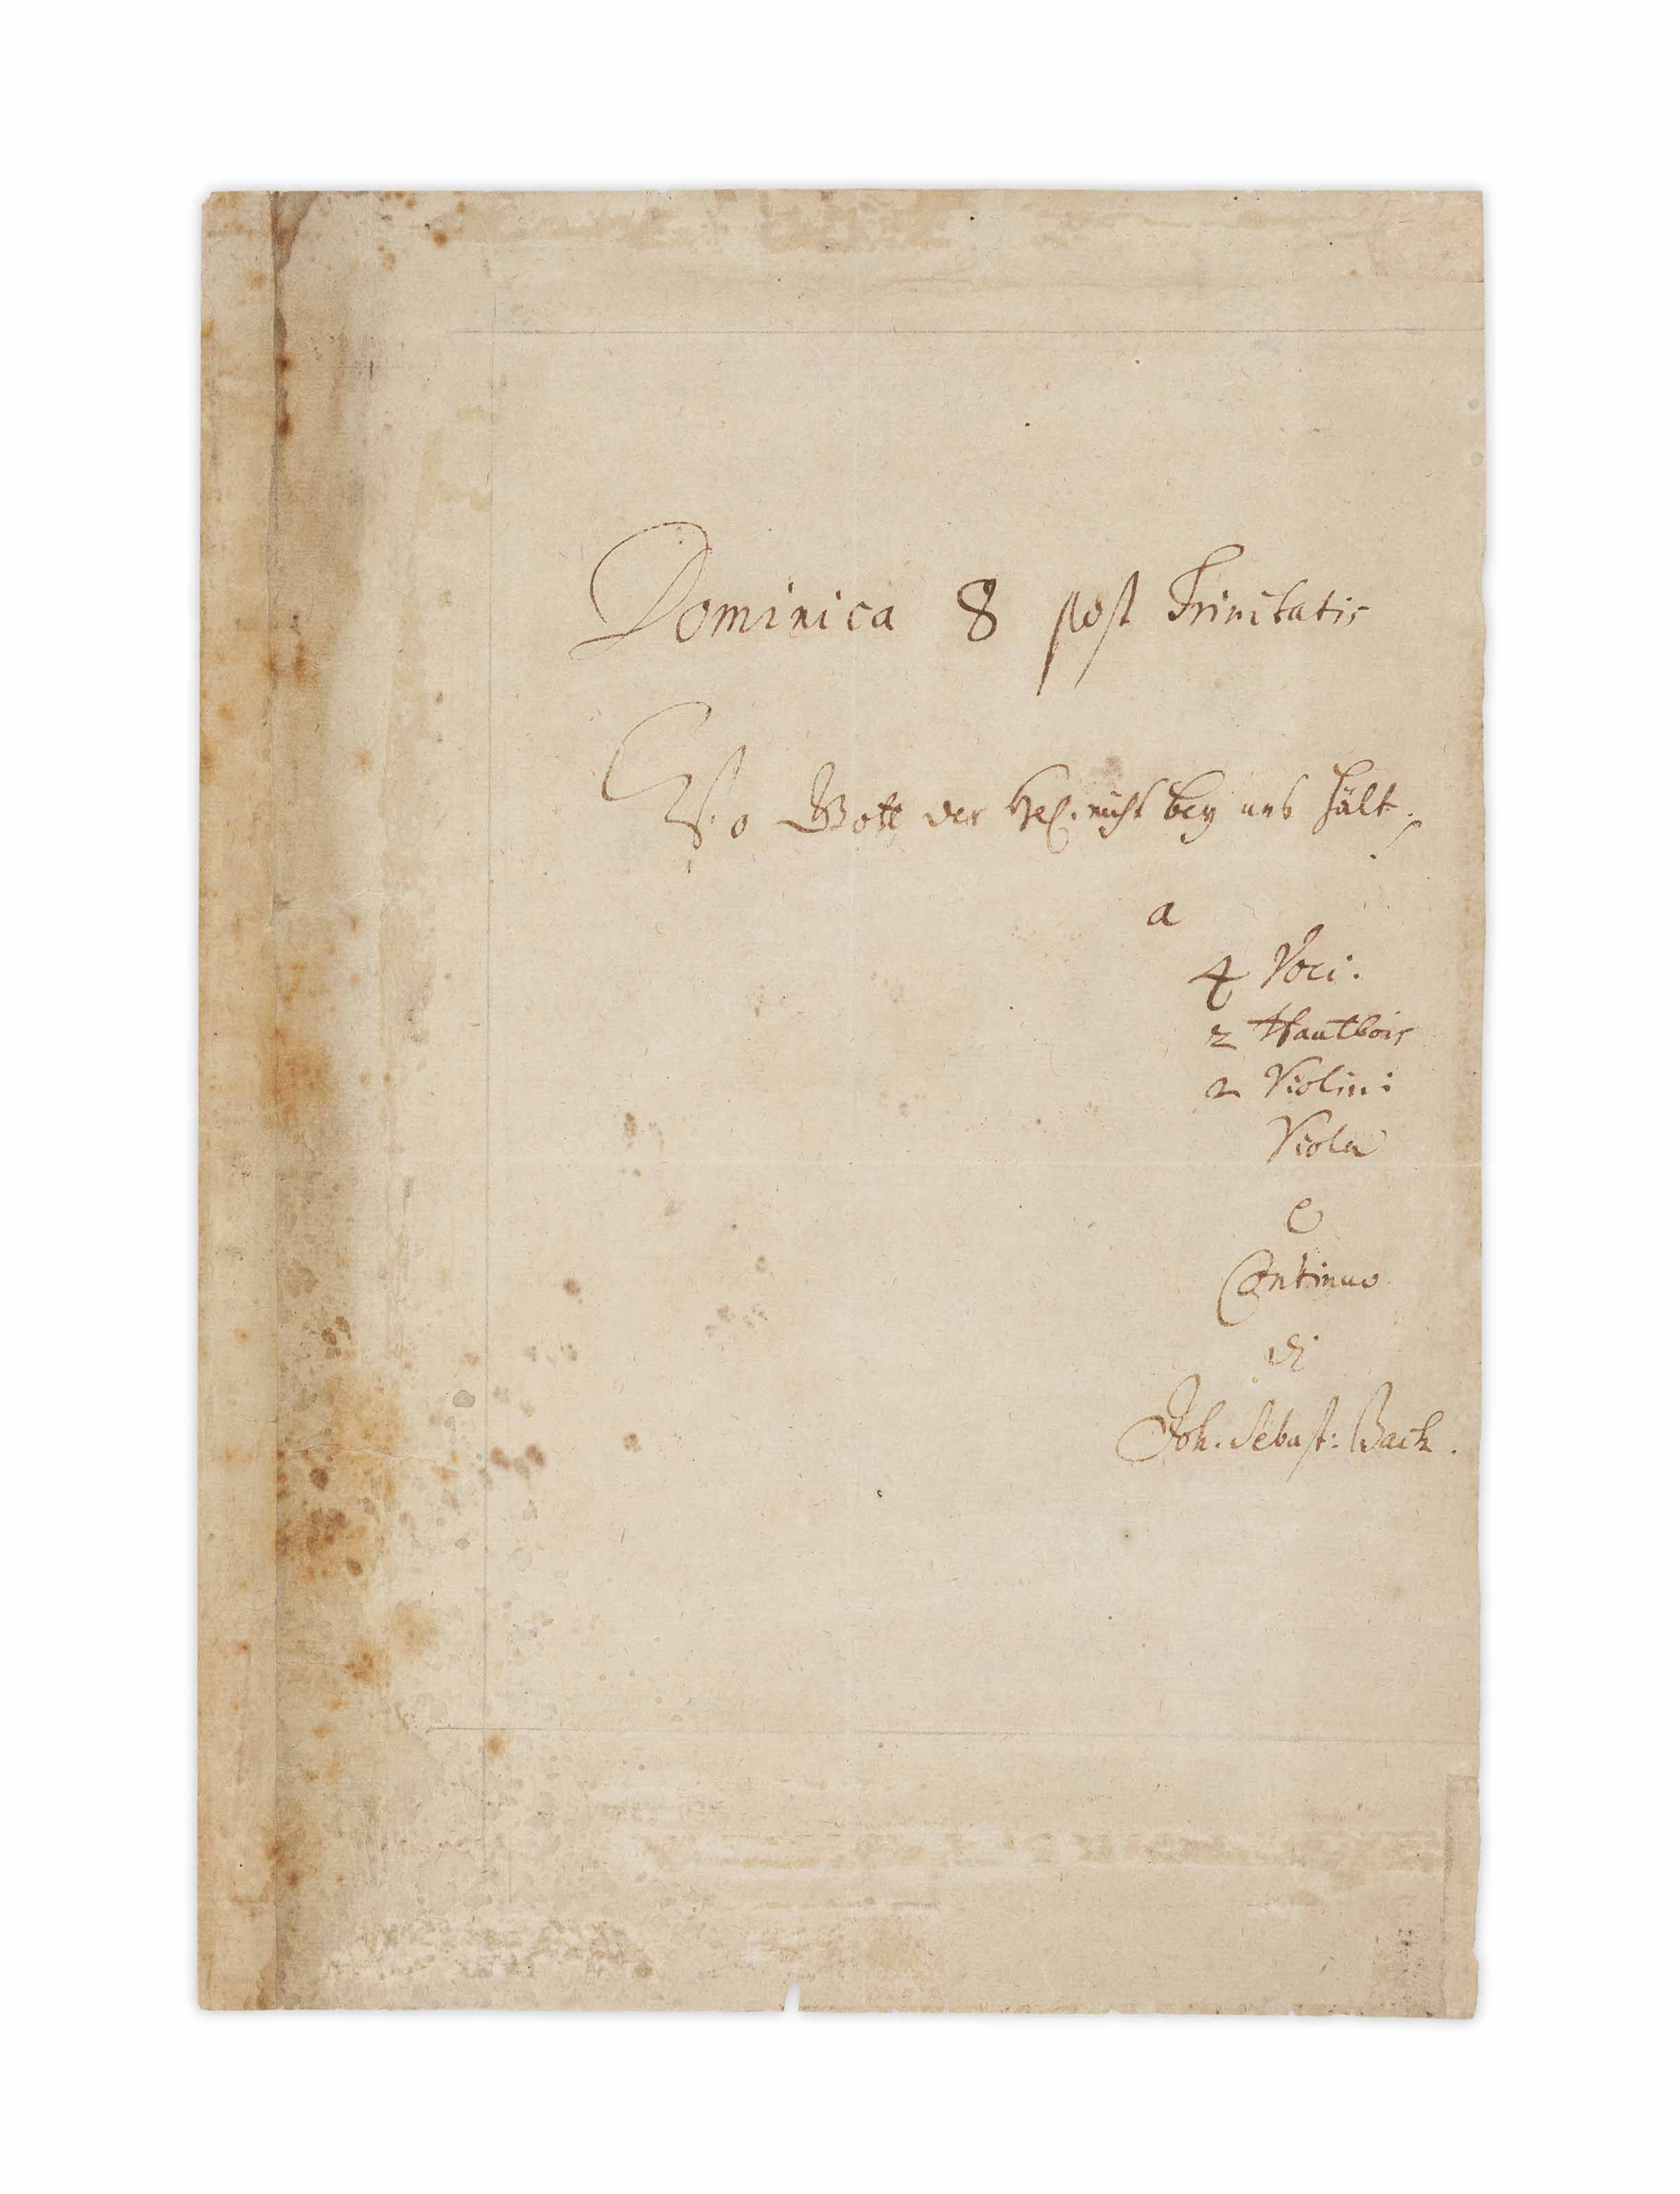 BACH, Johann Sebastian (1685-1750). Autograph manuscript signed ('Joh. Sebast: Bach'), the title page for the cantata BWV 178, 'Wo Gott der Herr nicht bei uns hält', n.p. [Leipzig], 'Dominica 8 post Trinitatis' [30 July 1724].